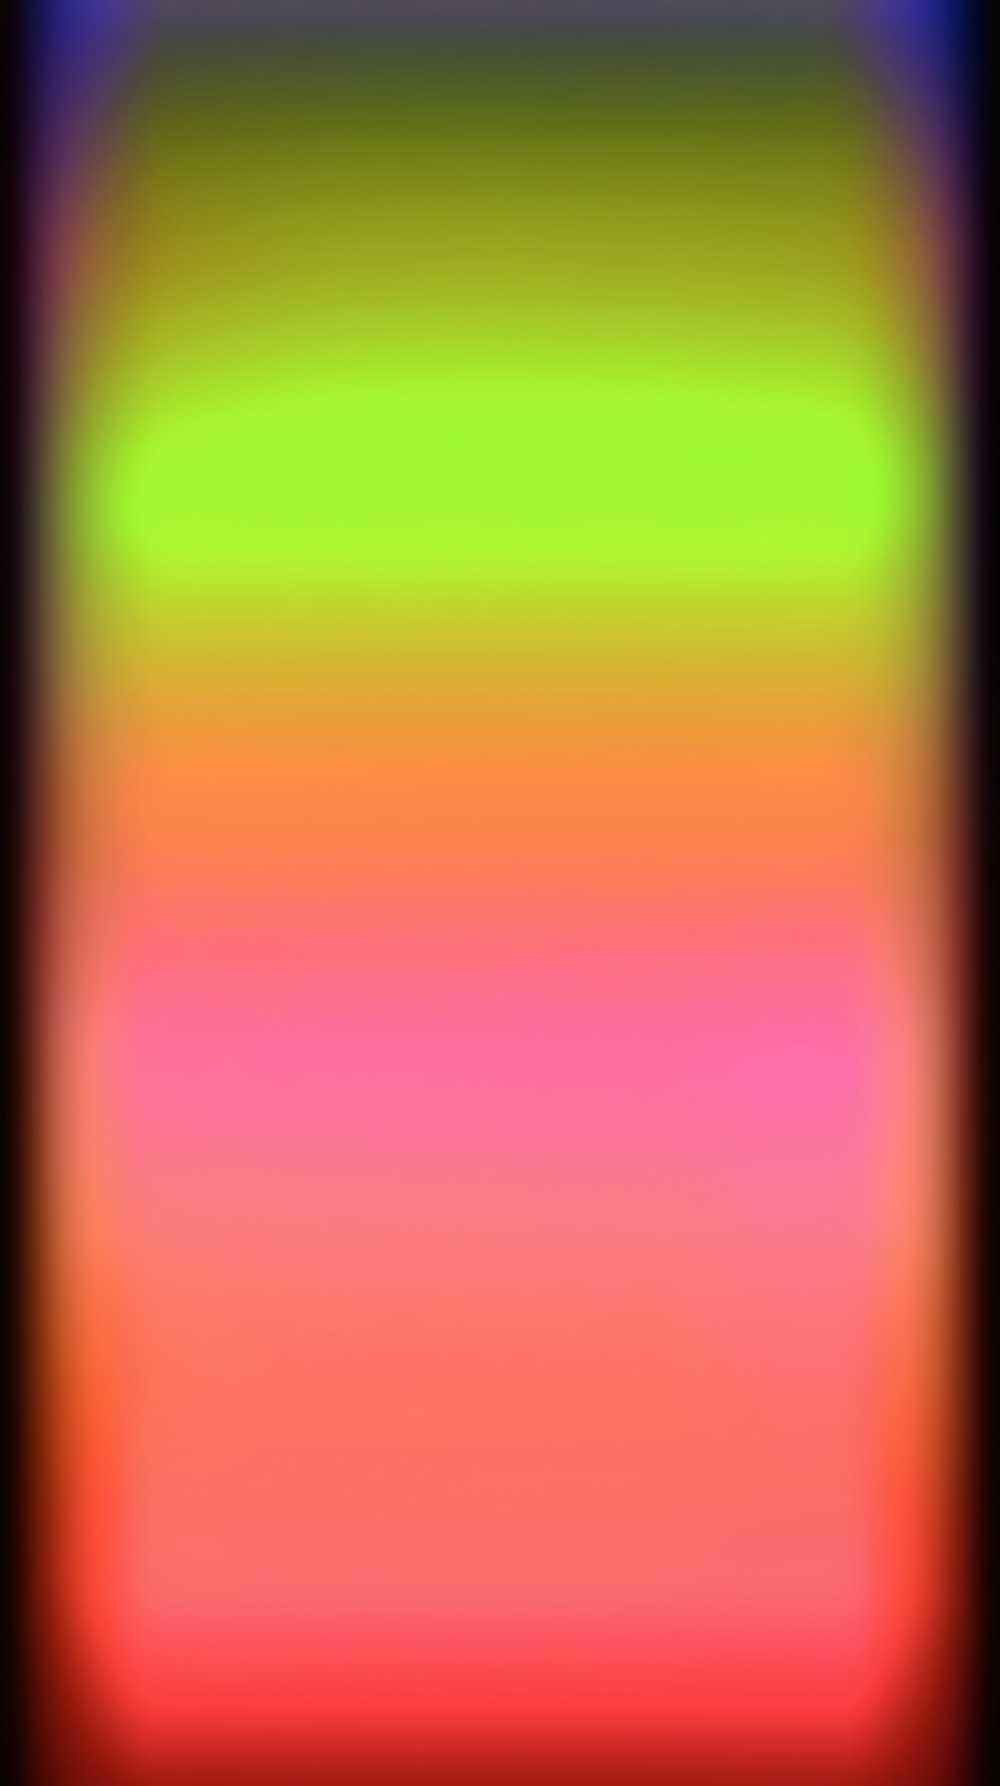 richard garet perceptual; the mirror 2015 moving image installation (still), Screen memory Richard Garet in der galerie burster